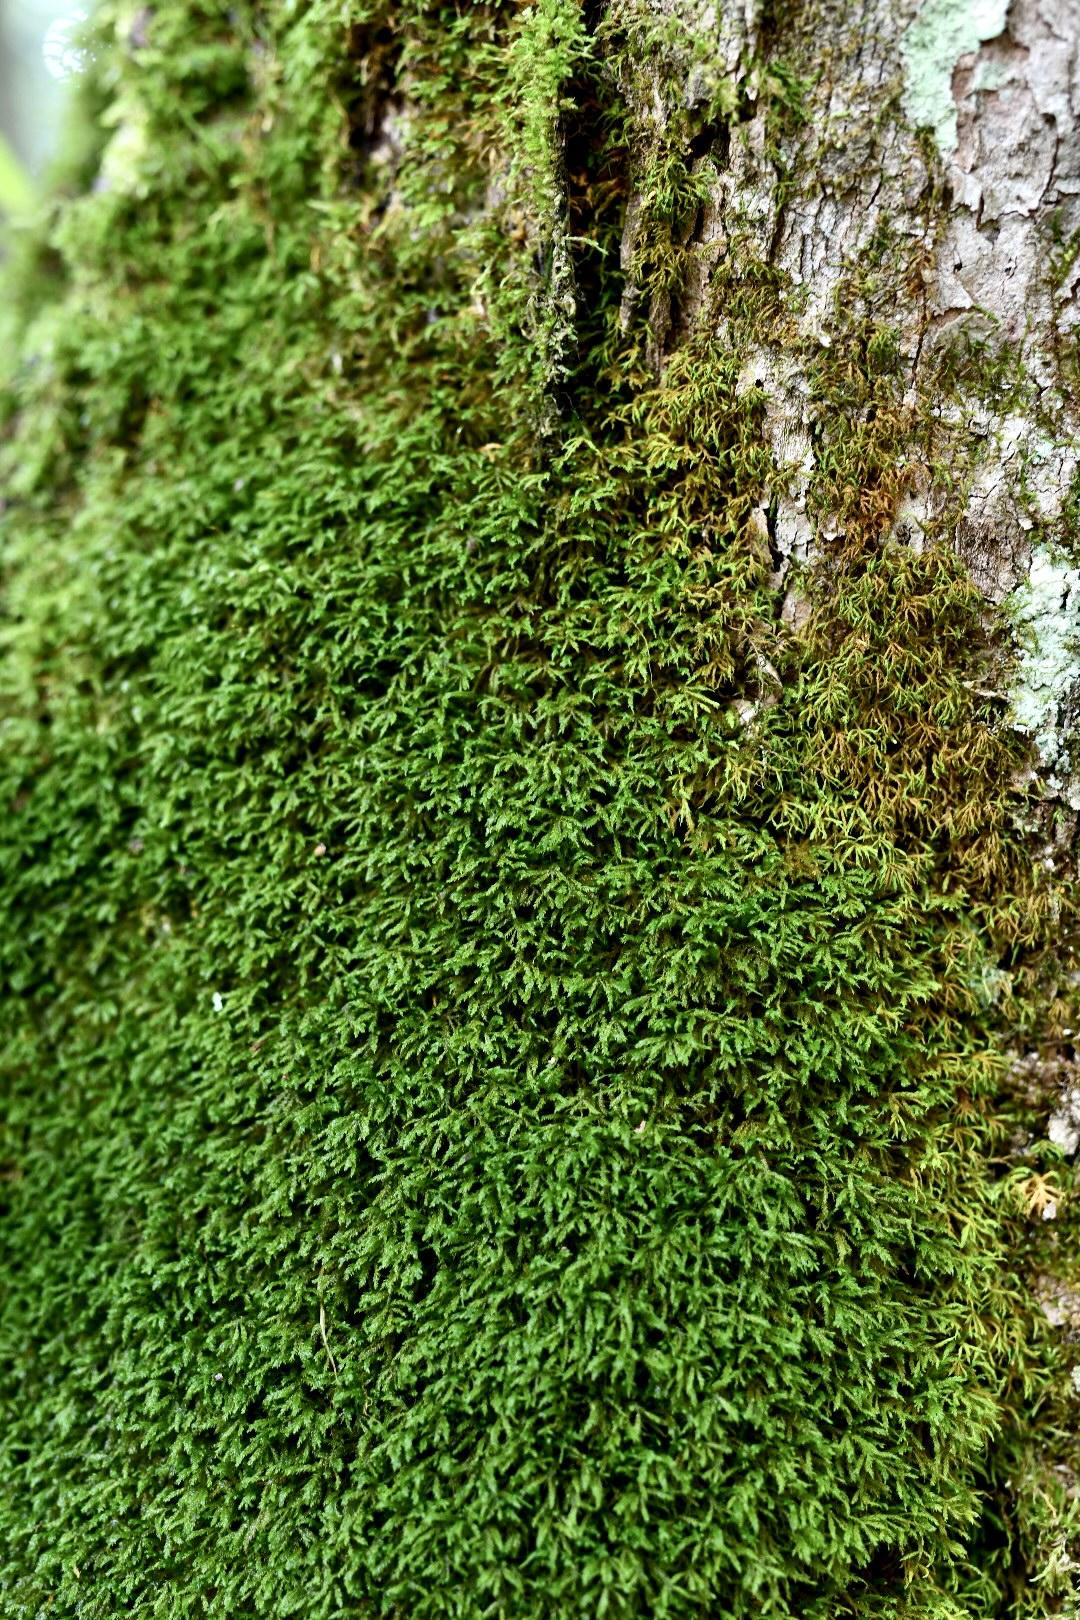 2021. Taryn Okesson. Digital Photography. Winona State Forest, New York.